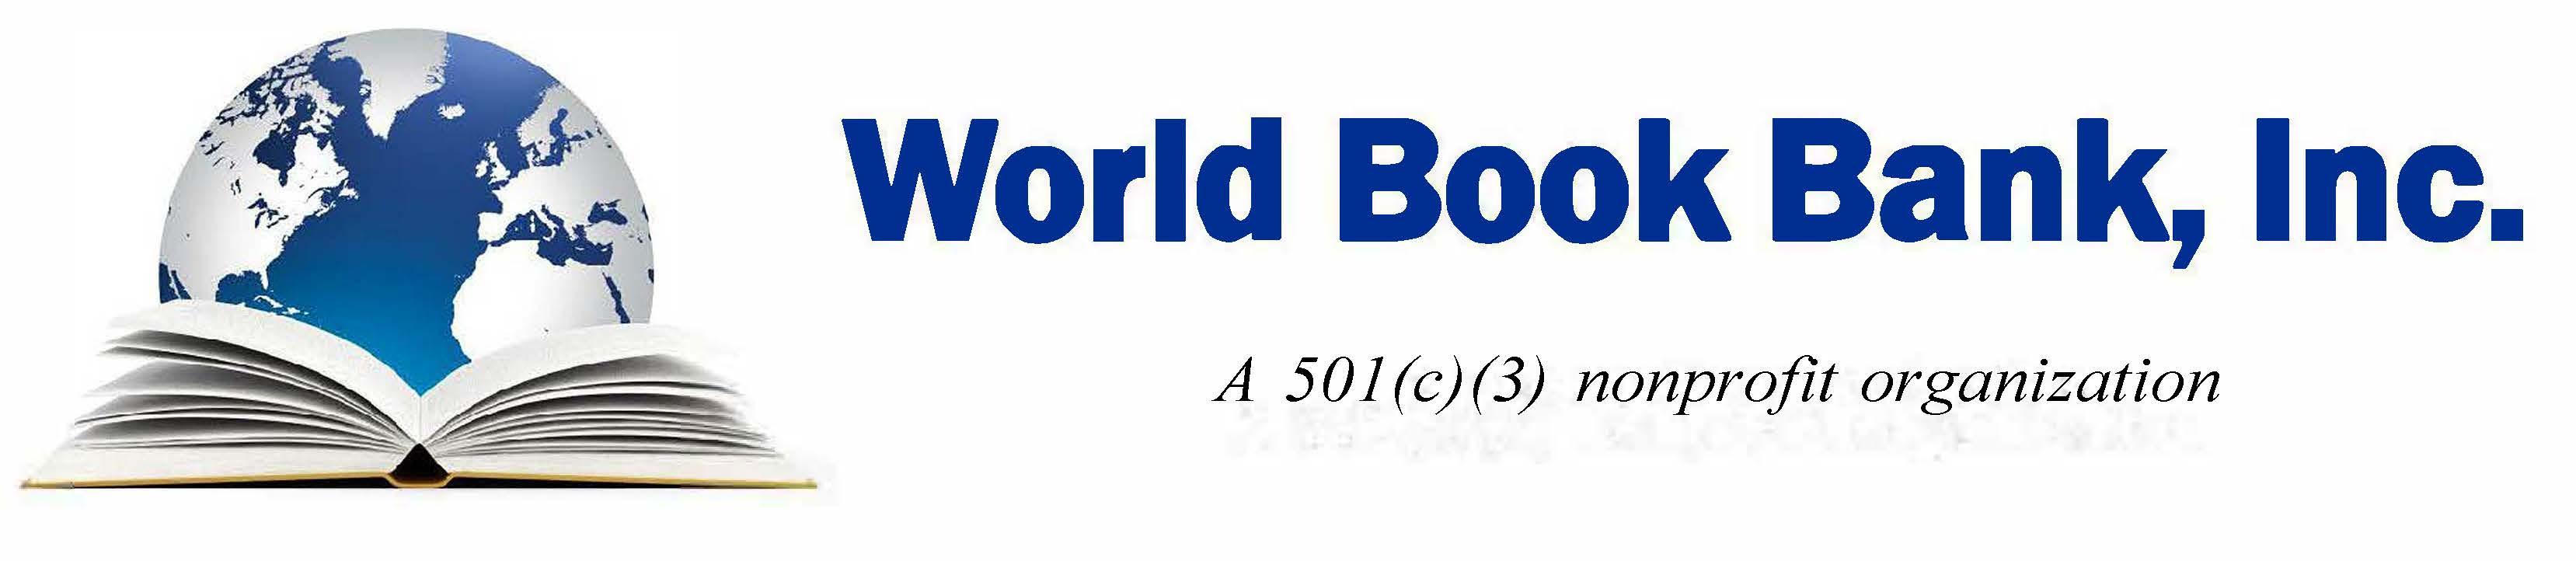 WBB #1